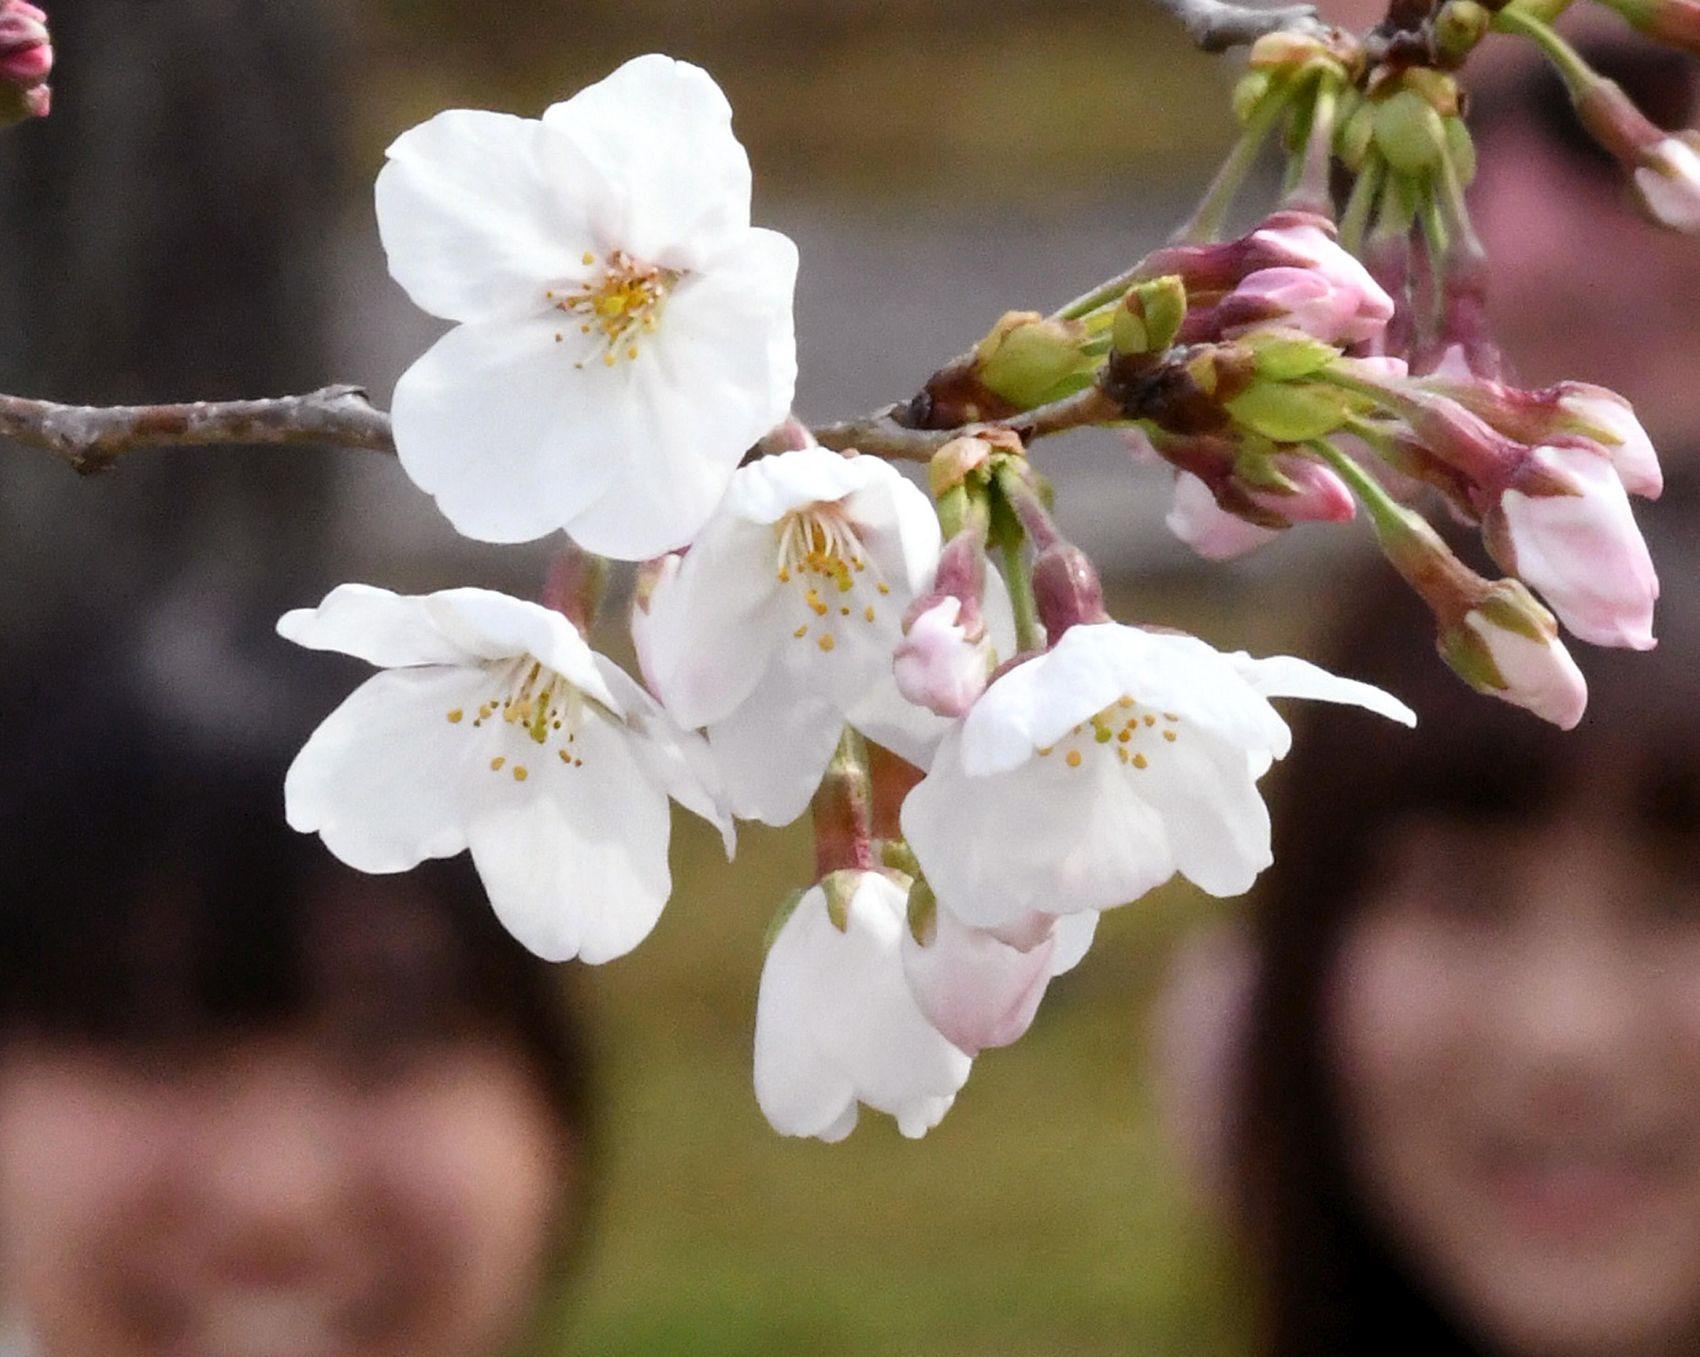 2019 Sakura Cherry Blossom in Japan